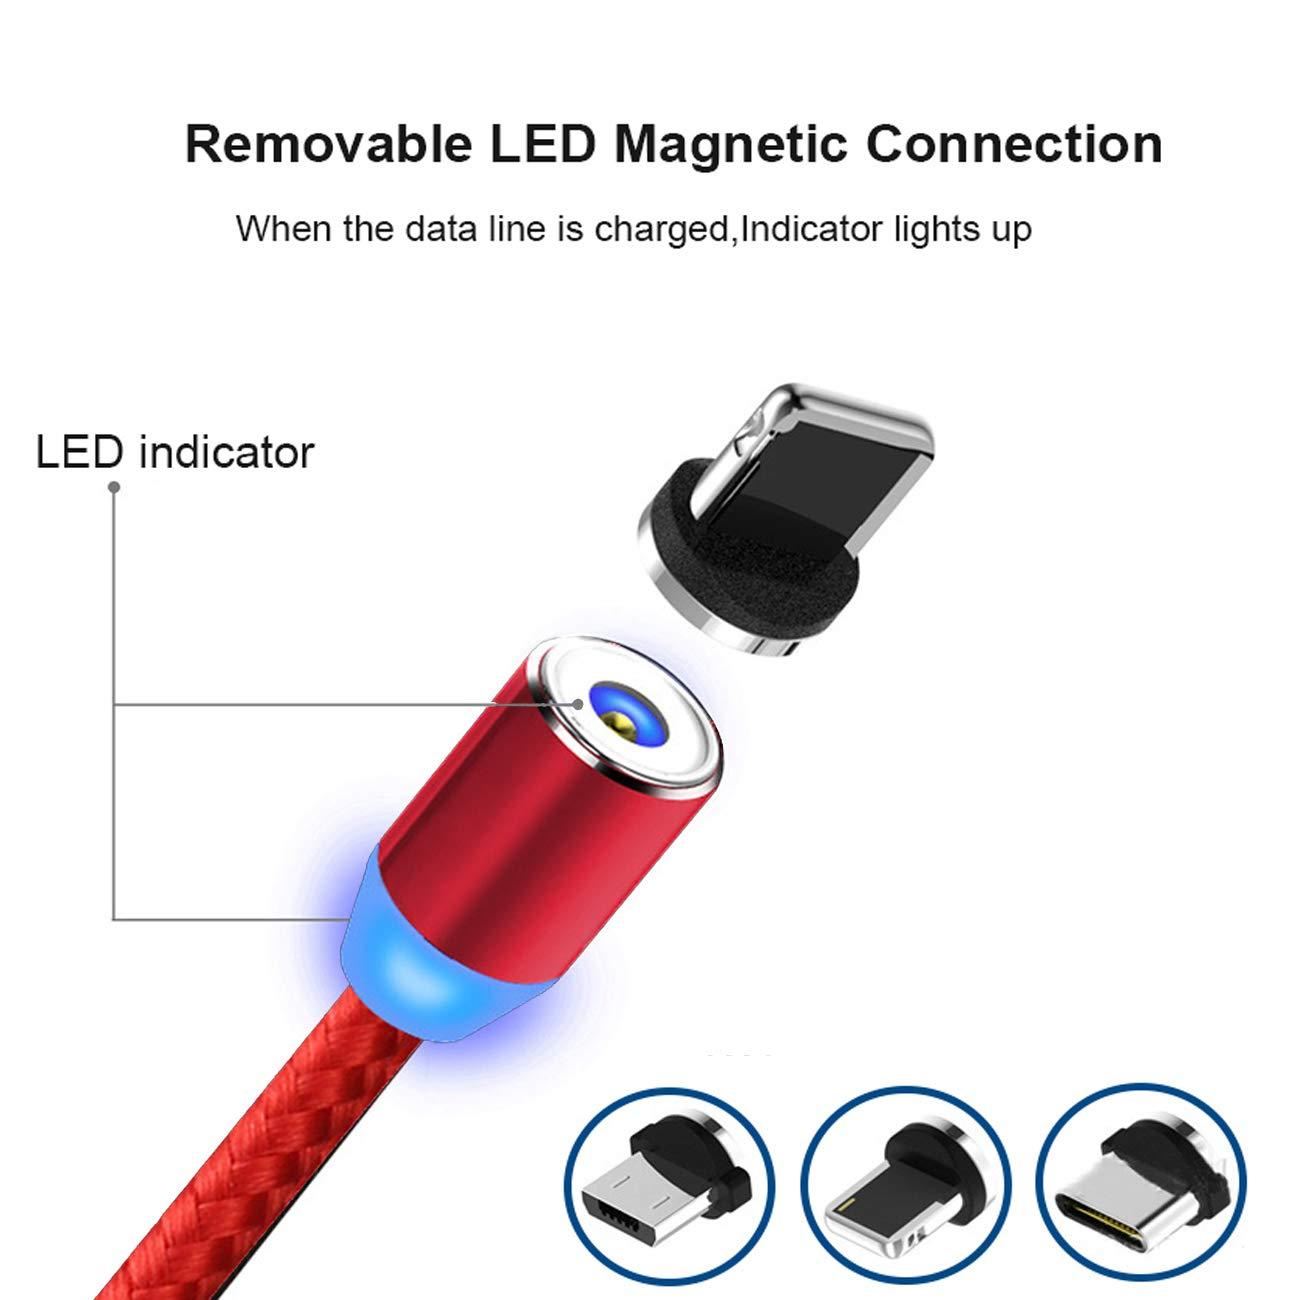 2M//6.6ft, 1-Rojo//Red Multi 3 en 1 Cable Magnetic de Carga Cargador iman con Adaptador Micro L USB Tipo C para Phone Kyerivs Cable USB Magn/ético con LED